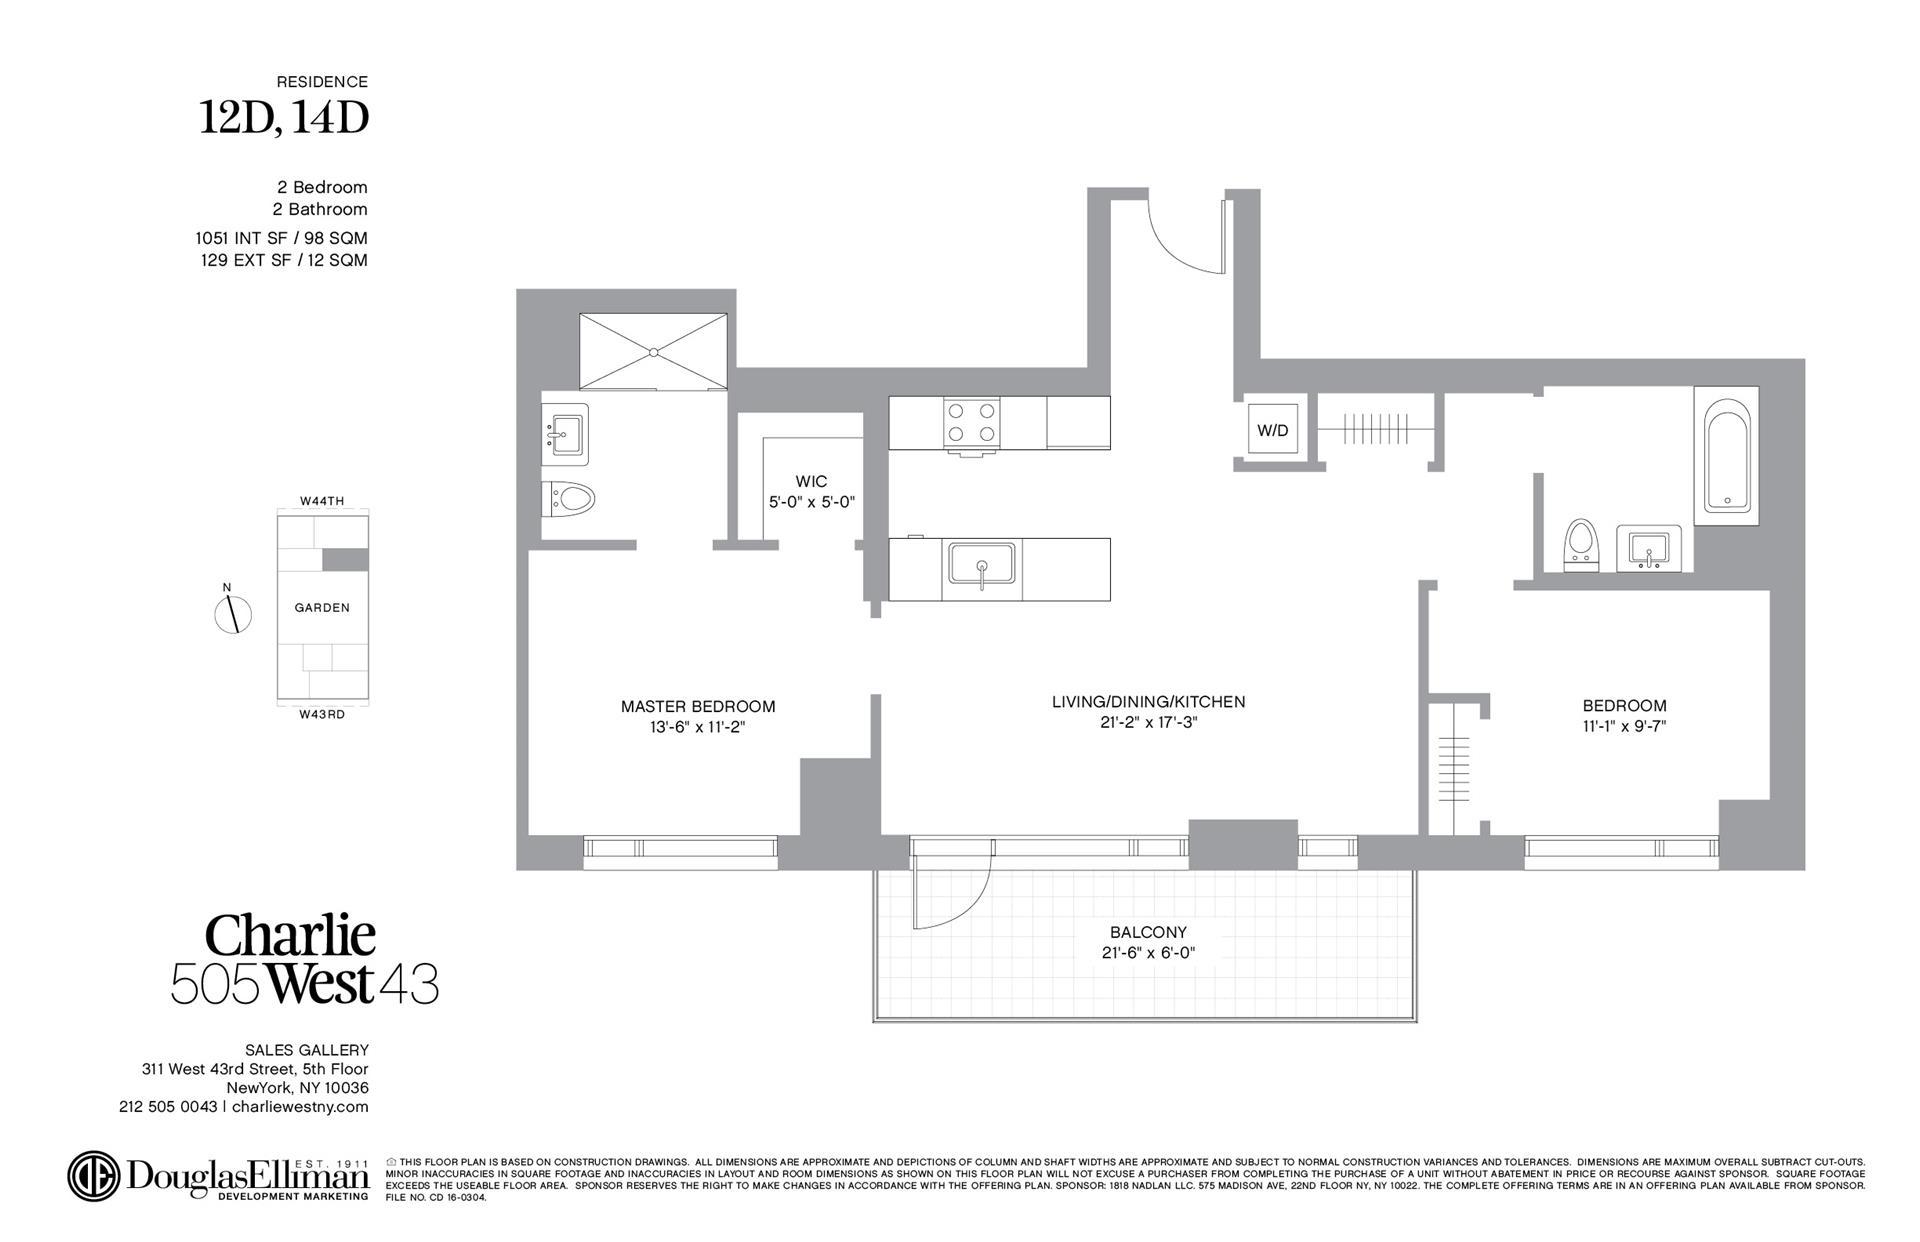 Floor plan of 505 West 43rd St, 12D - Clinton, New York